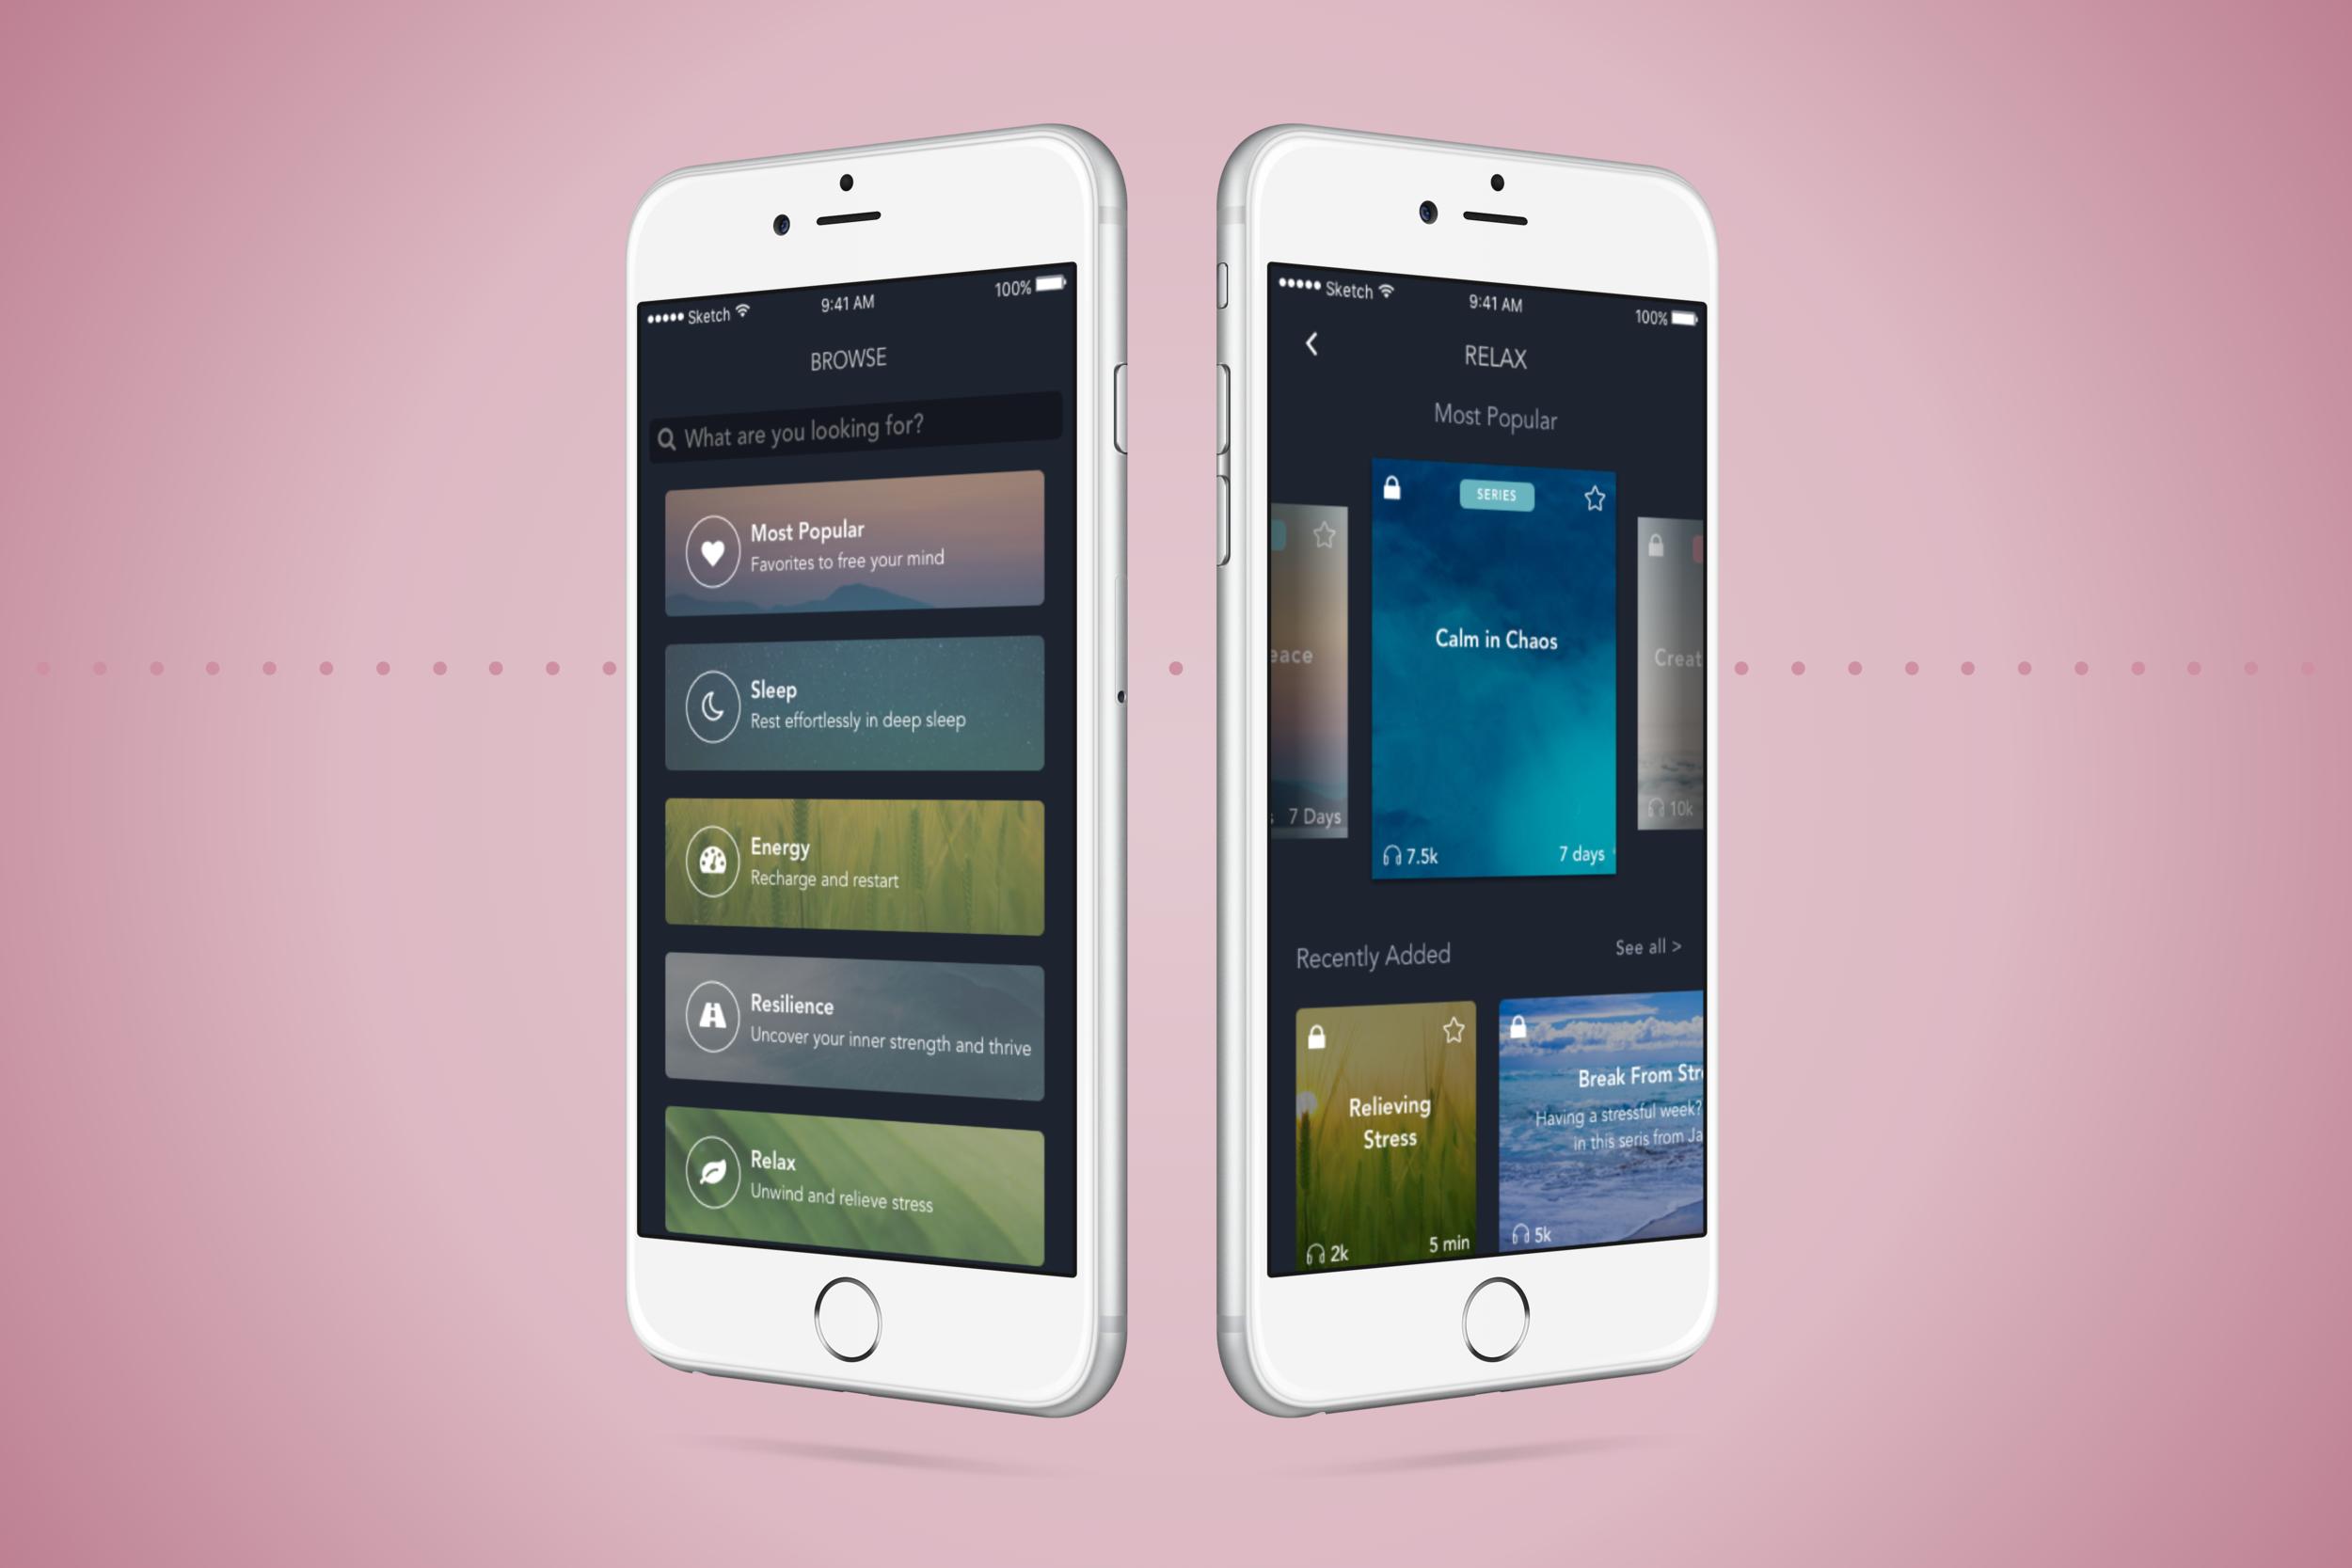 Simple HabitiOS Mobile App Redesign - view now >